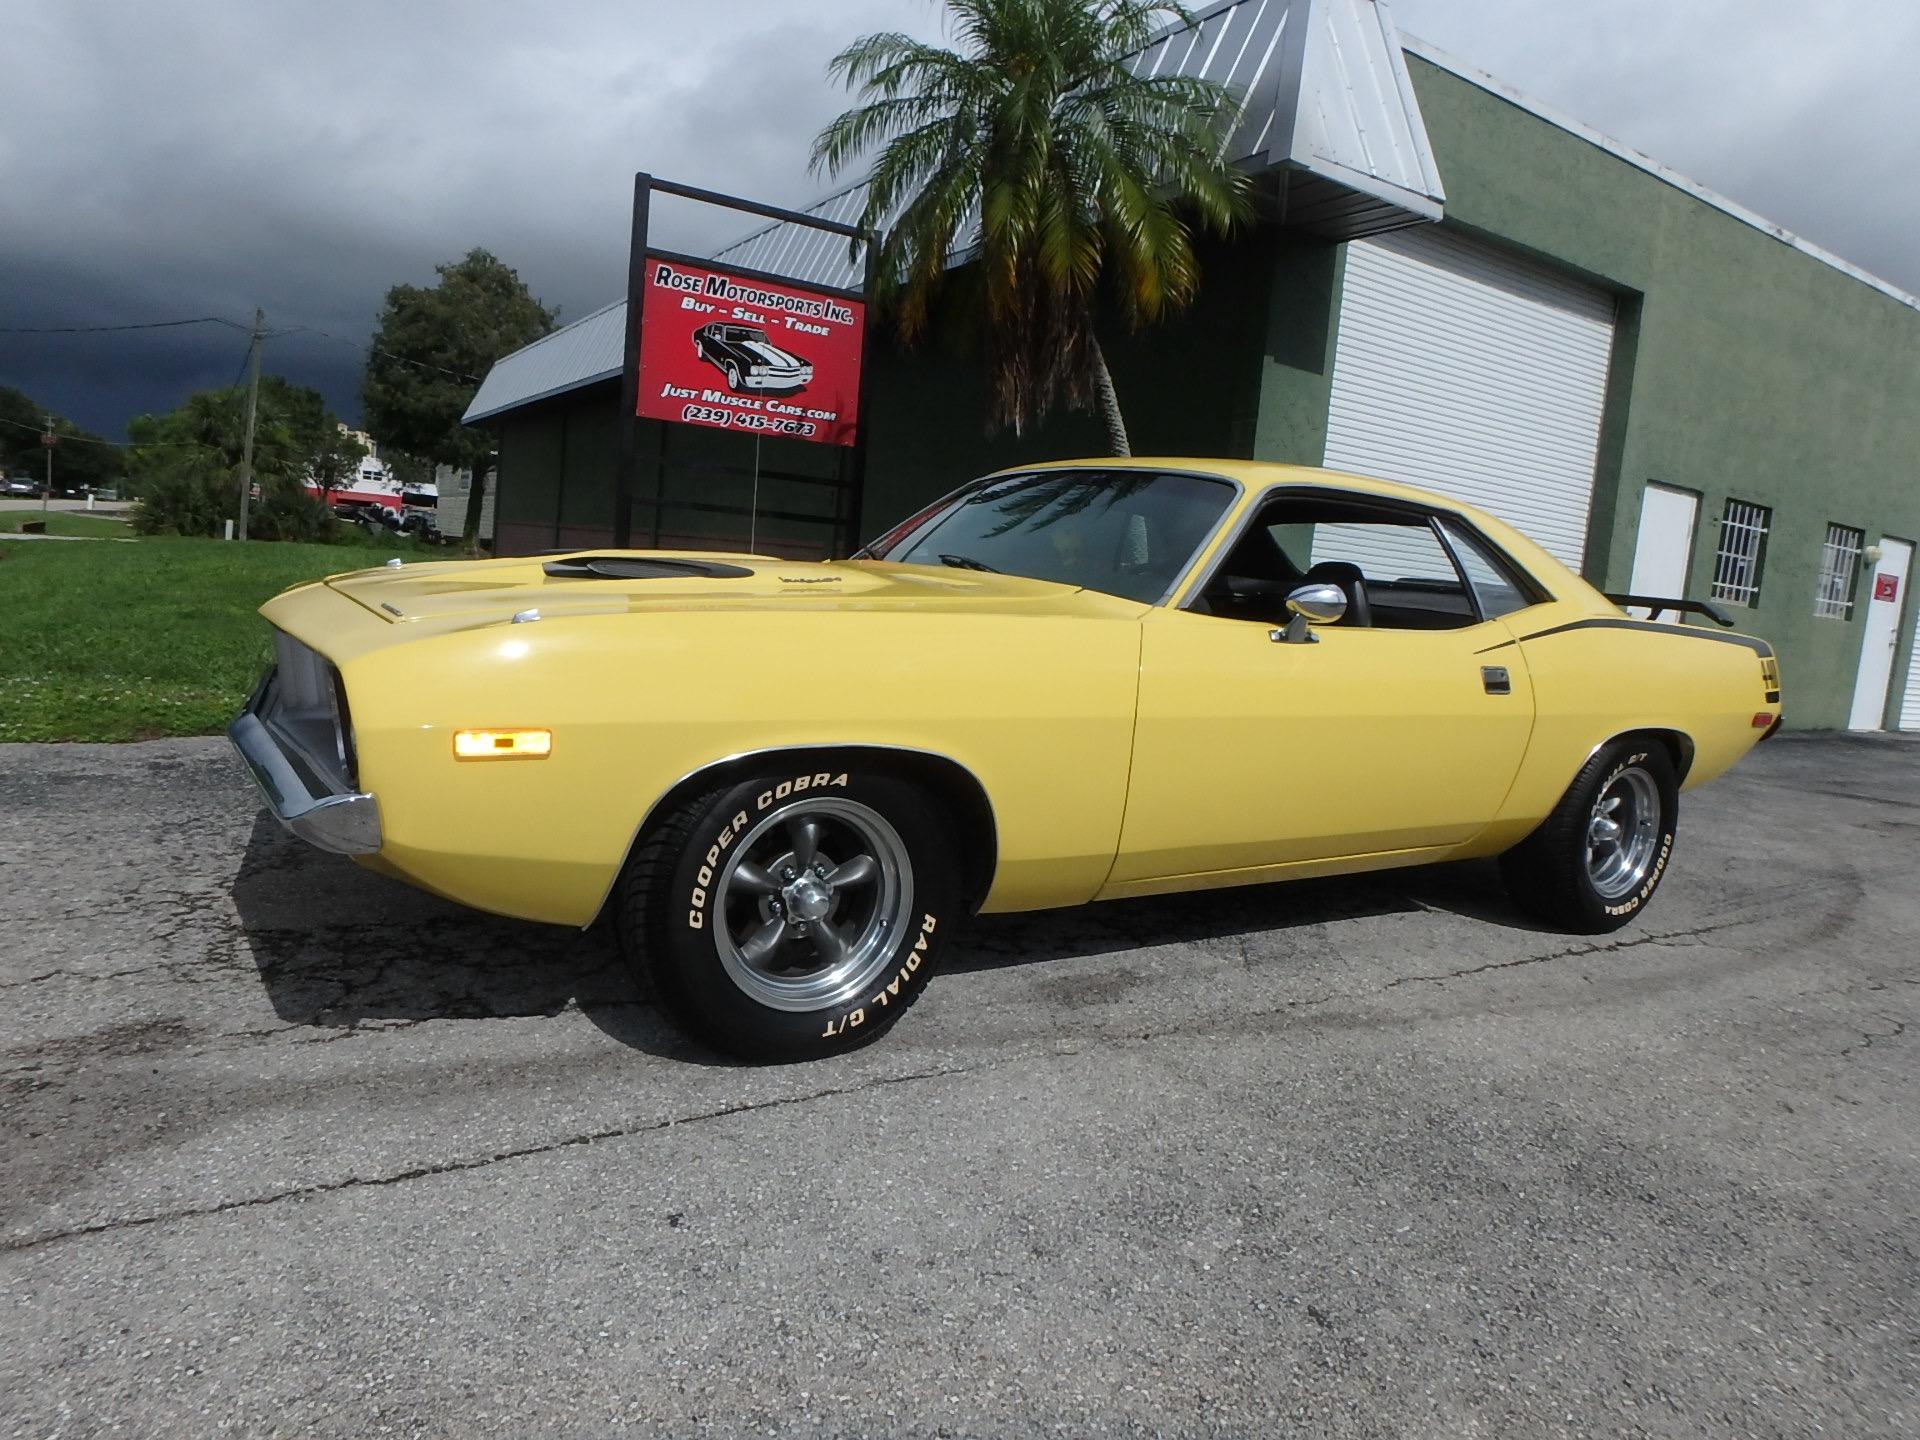 Used-1973-Plymouth-Cuda